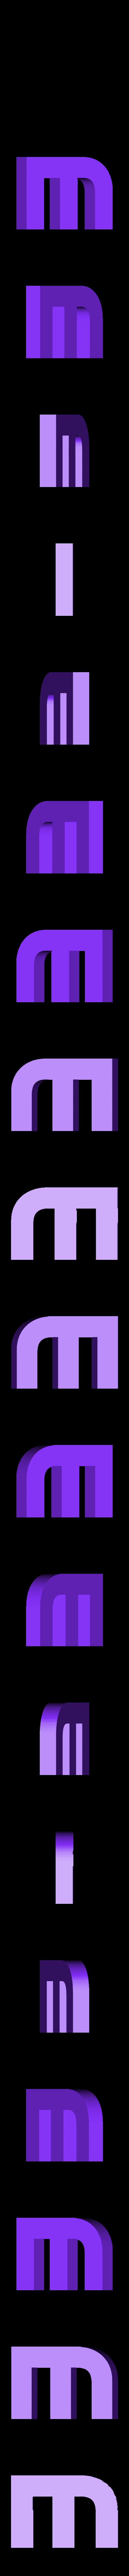 MD_m_01.stl Download free STL file Dark Matter - Main Title Logo • 3D printer object, SYFY